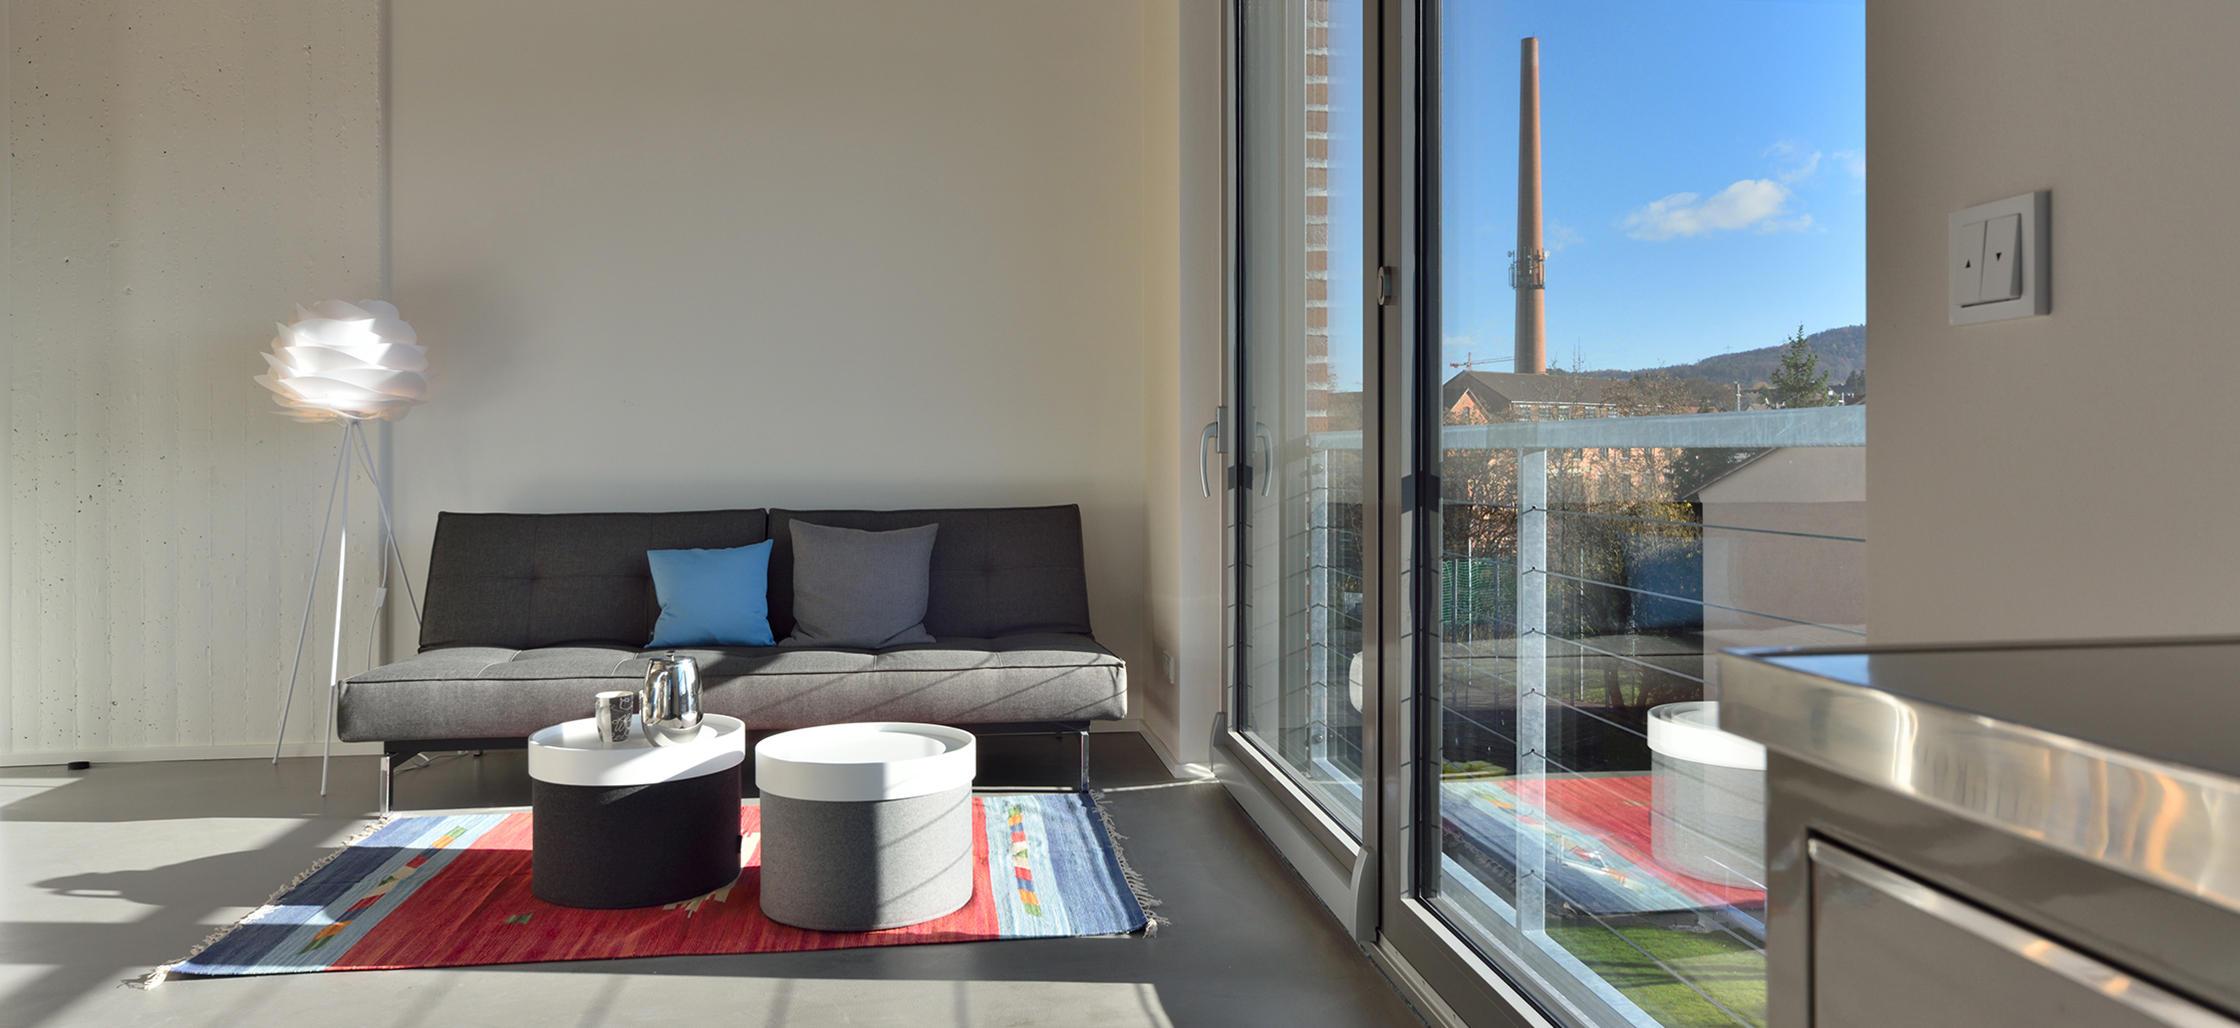 LOFT apartments Schorndorf :: Home